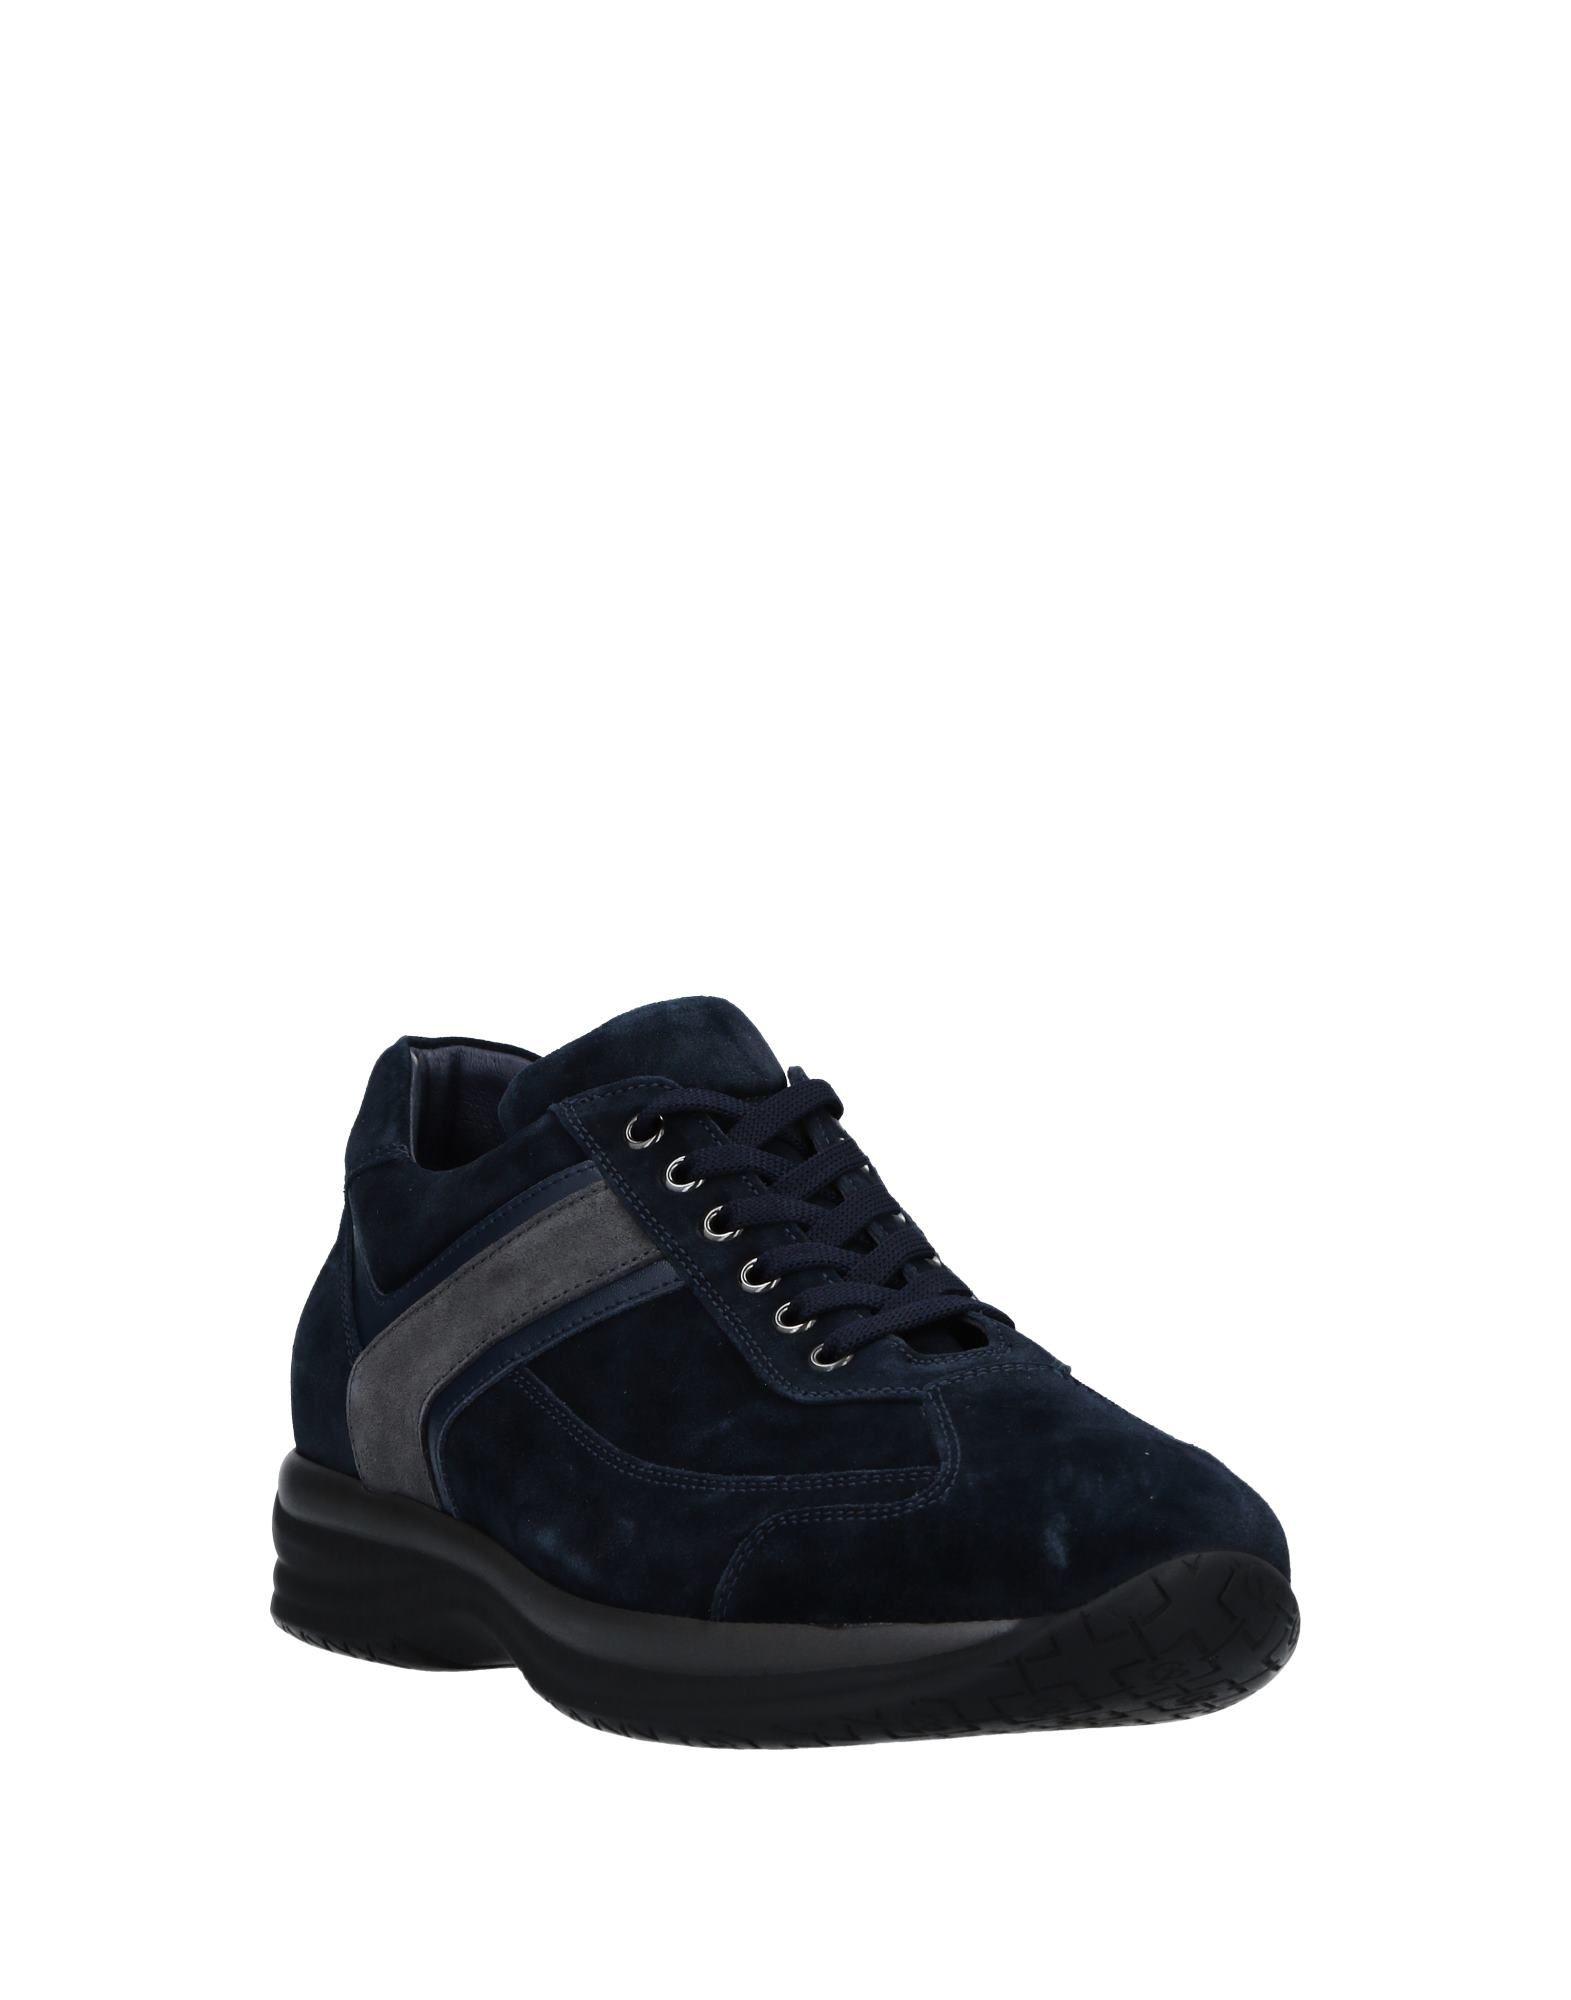 Cesare P. Sneakers Qualität Herren  11534397UK Gute Qualität Sneakers beliebte Schuhe da59b5